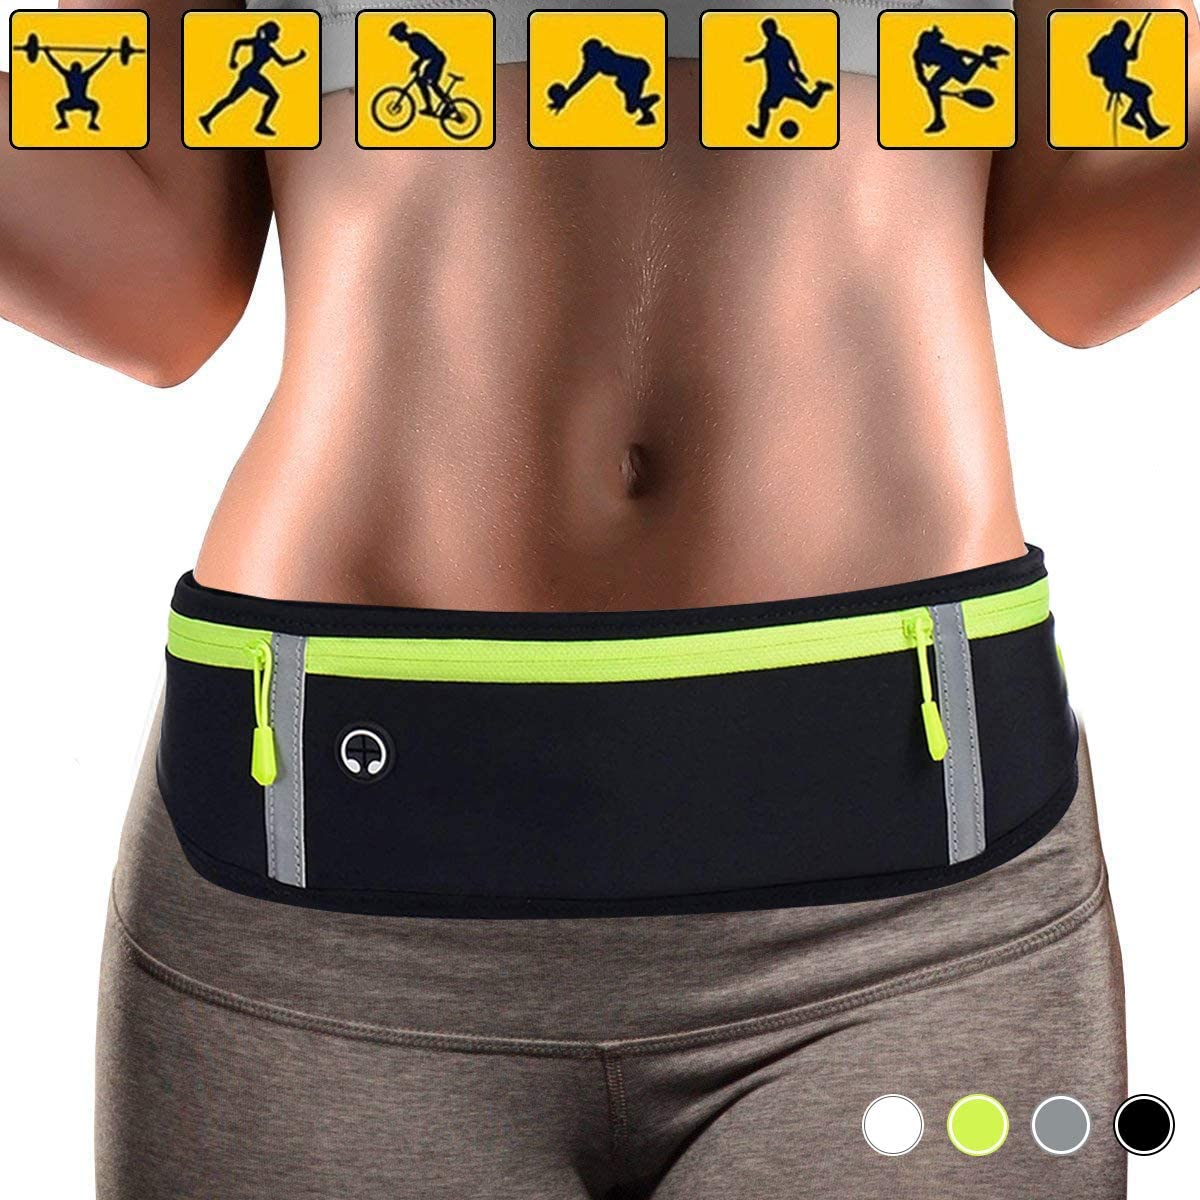 SIZIMA Running Belt Waist Pack, Fitness Running Pouch Fanny Pack Waterproof Elastic Belt Jogging Waist Bag for Men, Women, Sports, Workouts, Cycling, Marathon, Gym, Samsung Apple iOS Andriod Phone